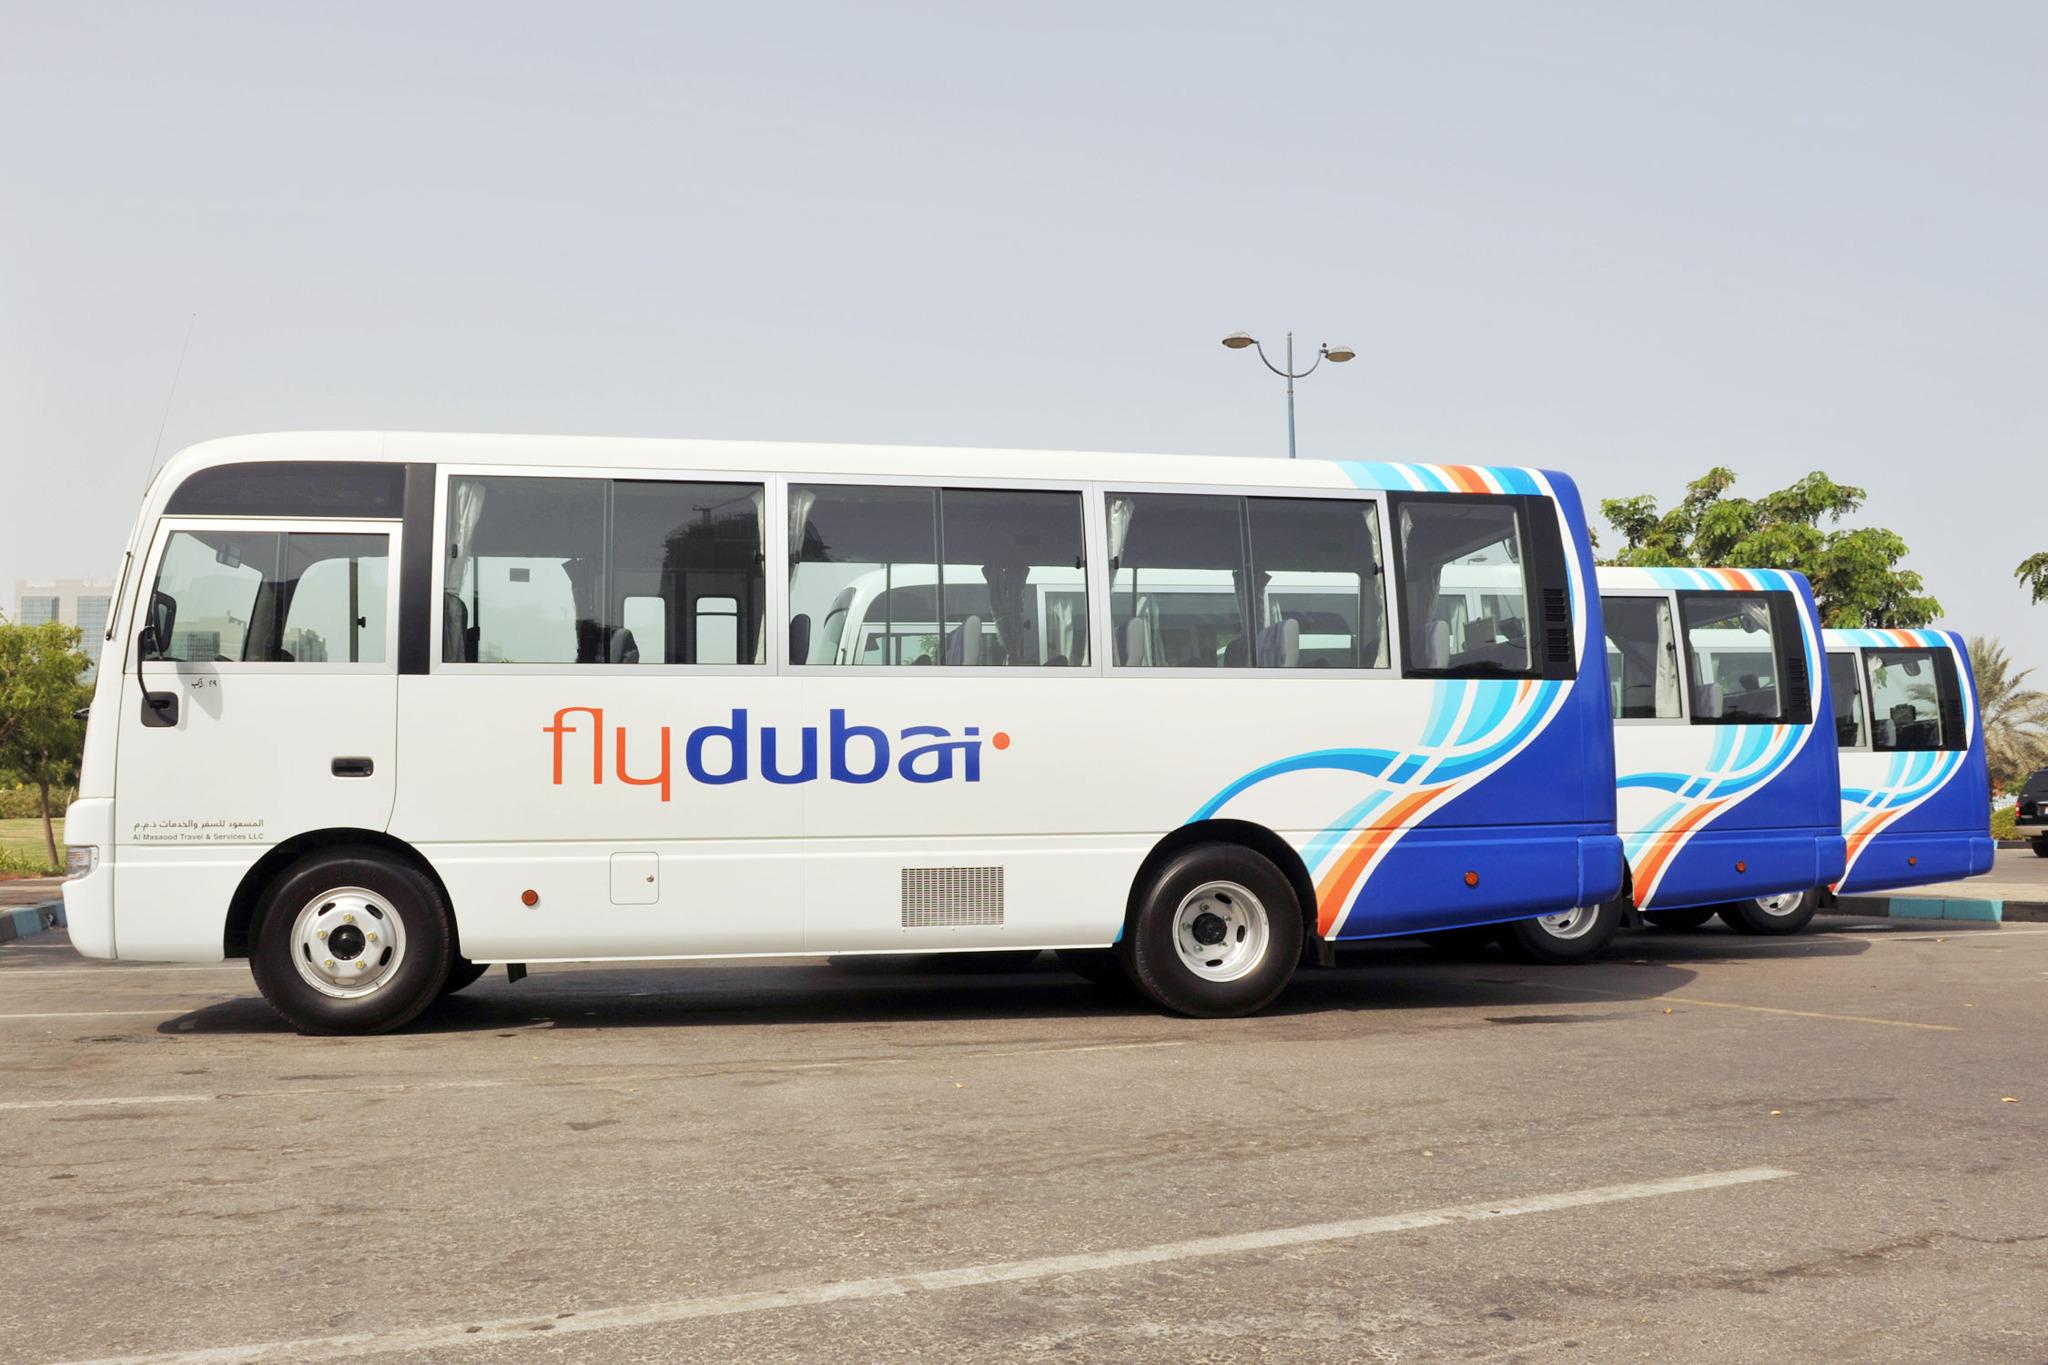 flydubai connects with the capital